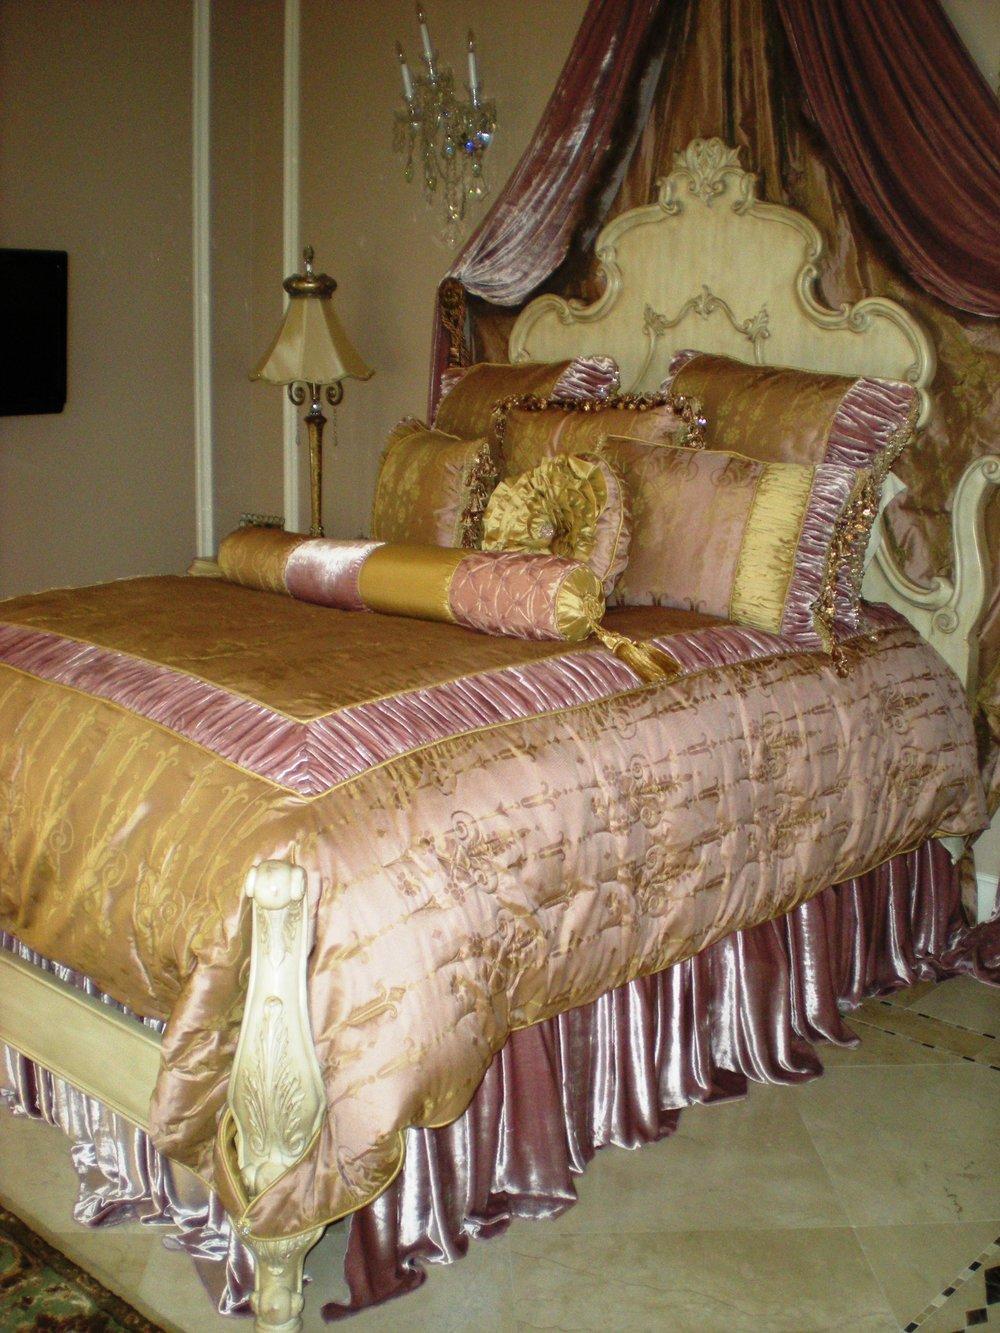 Canali Drapery Studio Custom Design Luxury Bedding and Pillows (25).JPG